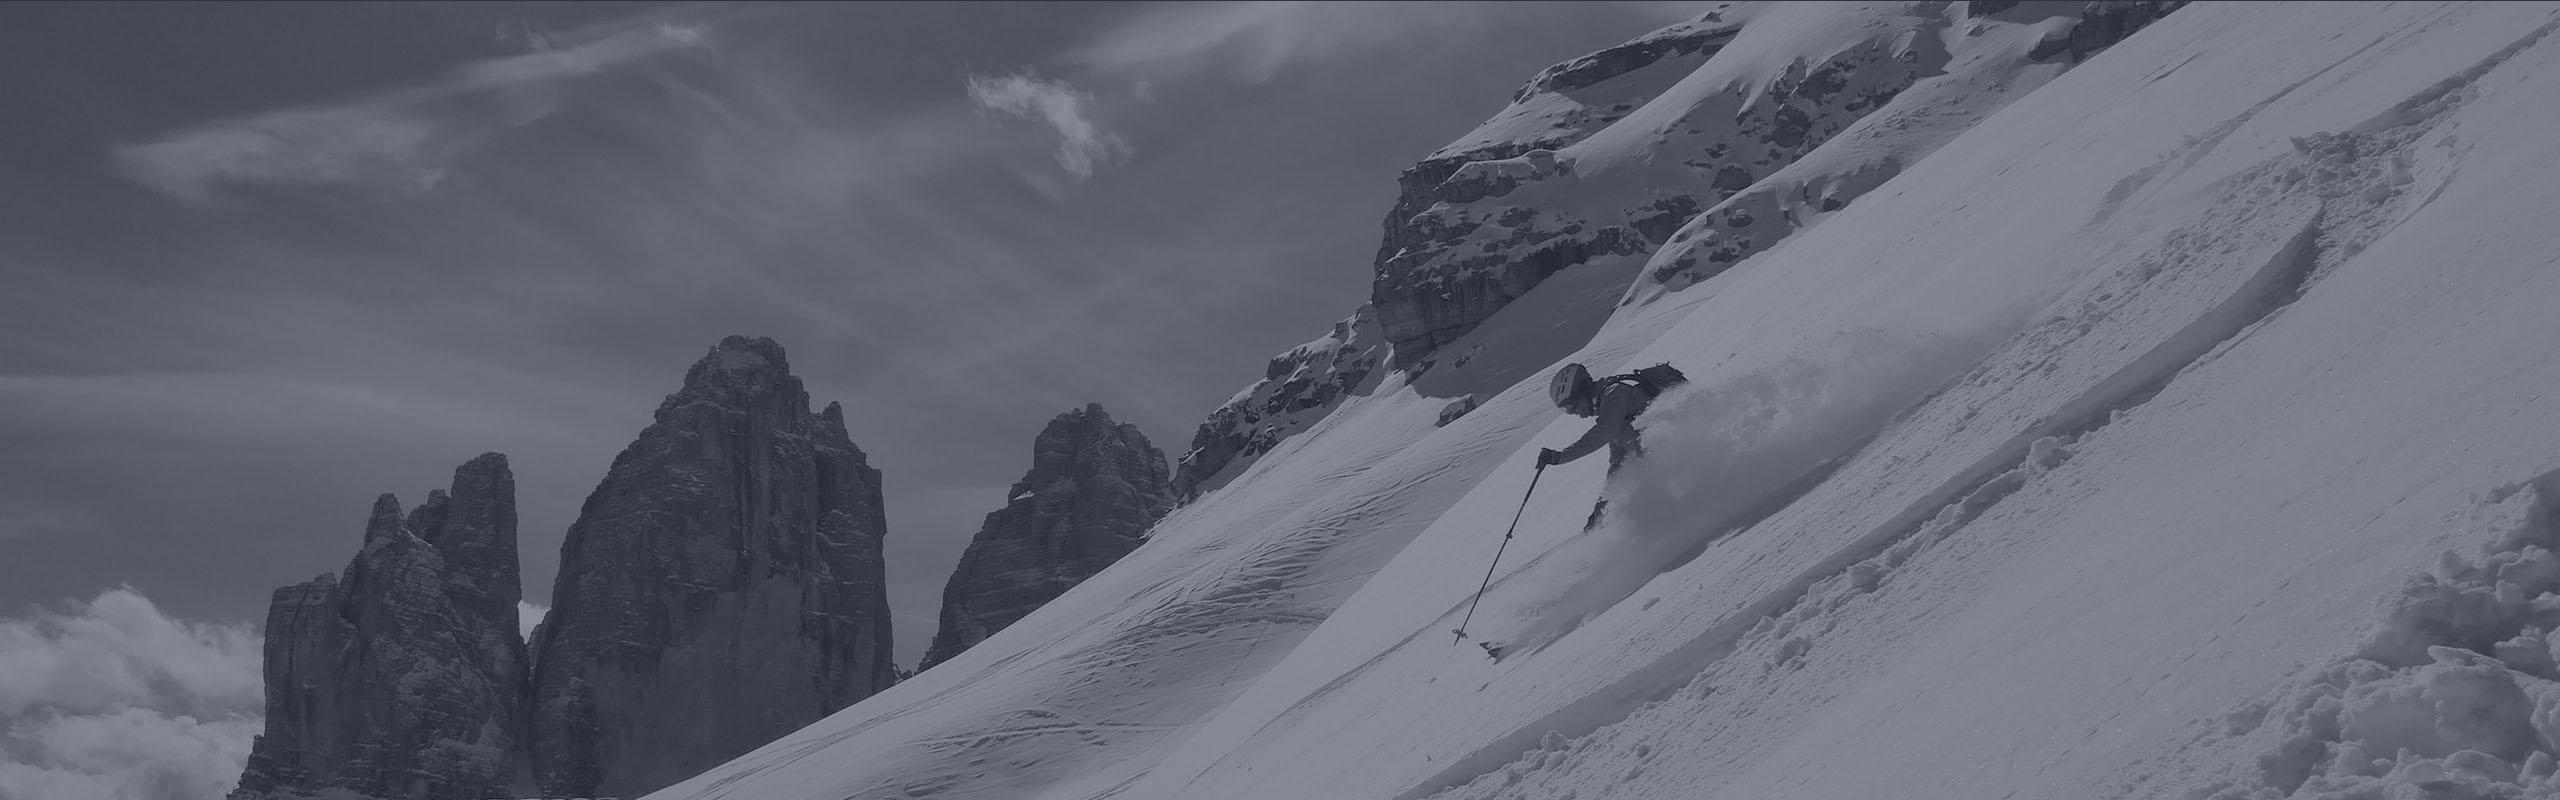 Kurs skiturowy II stopnia